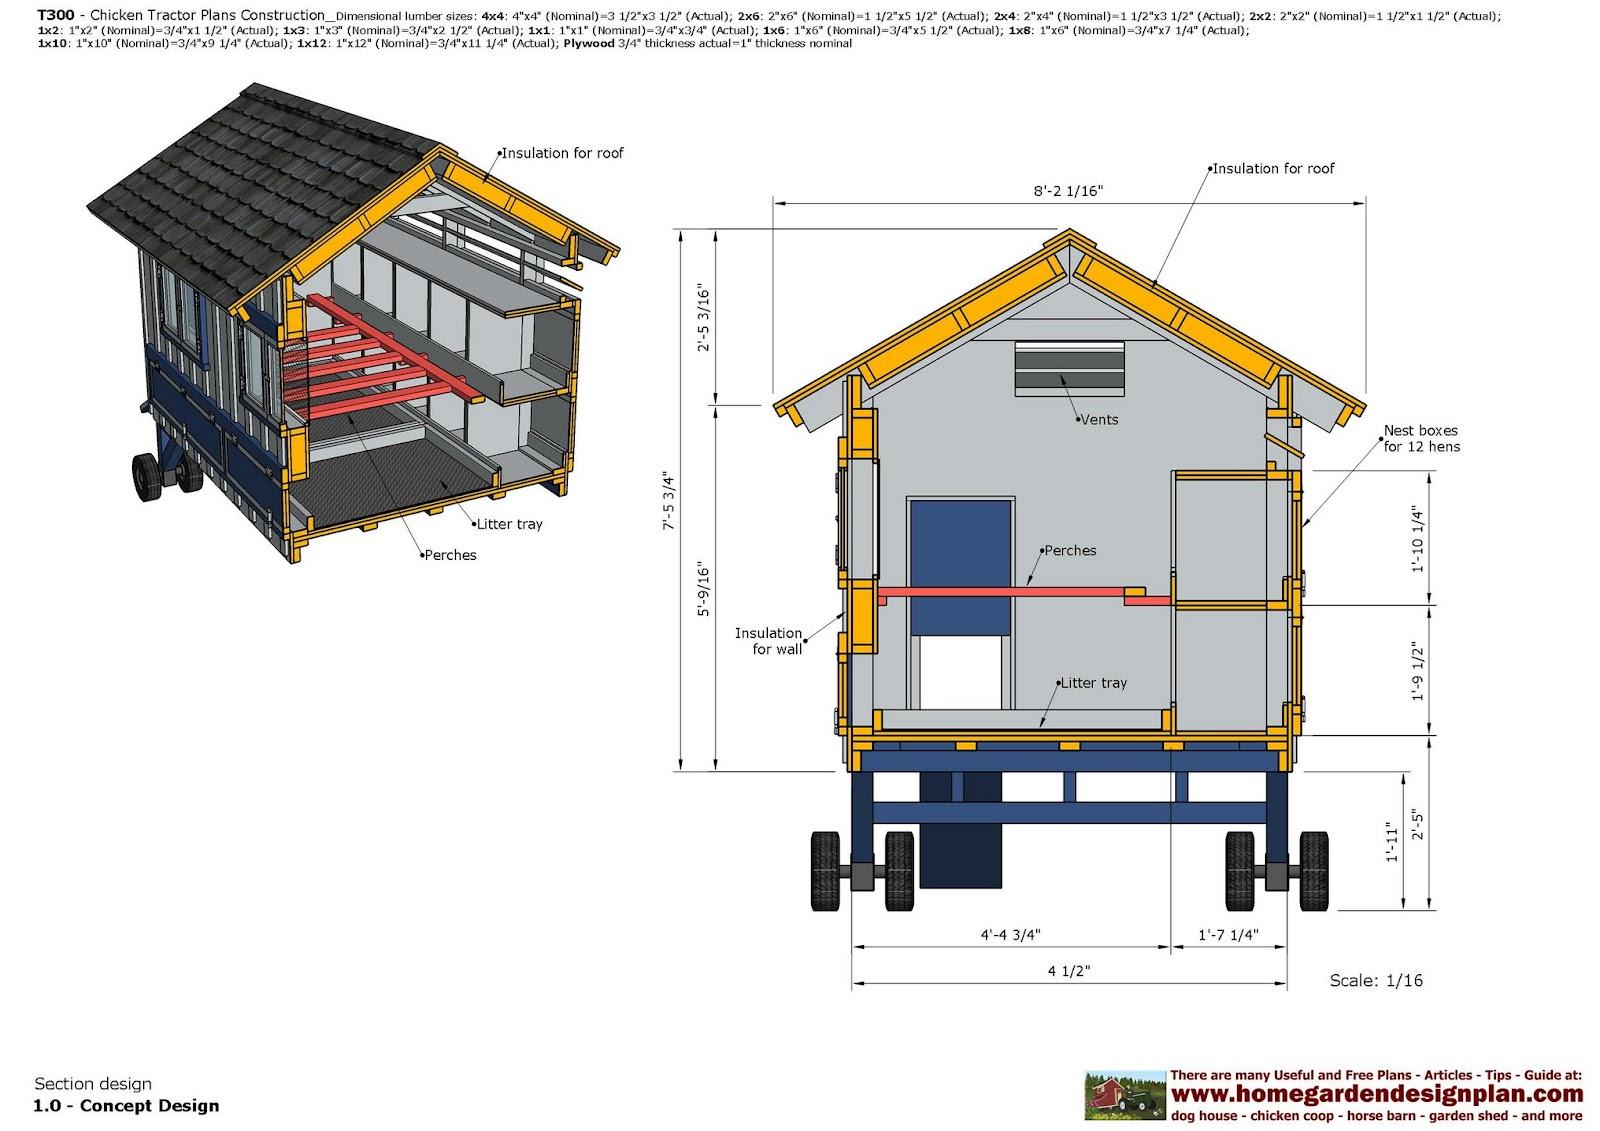 Home Garden Plans T300 Chicken Tractor Plans